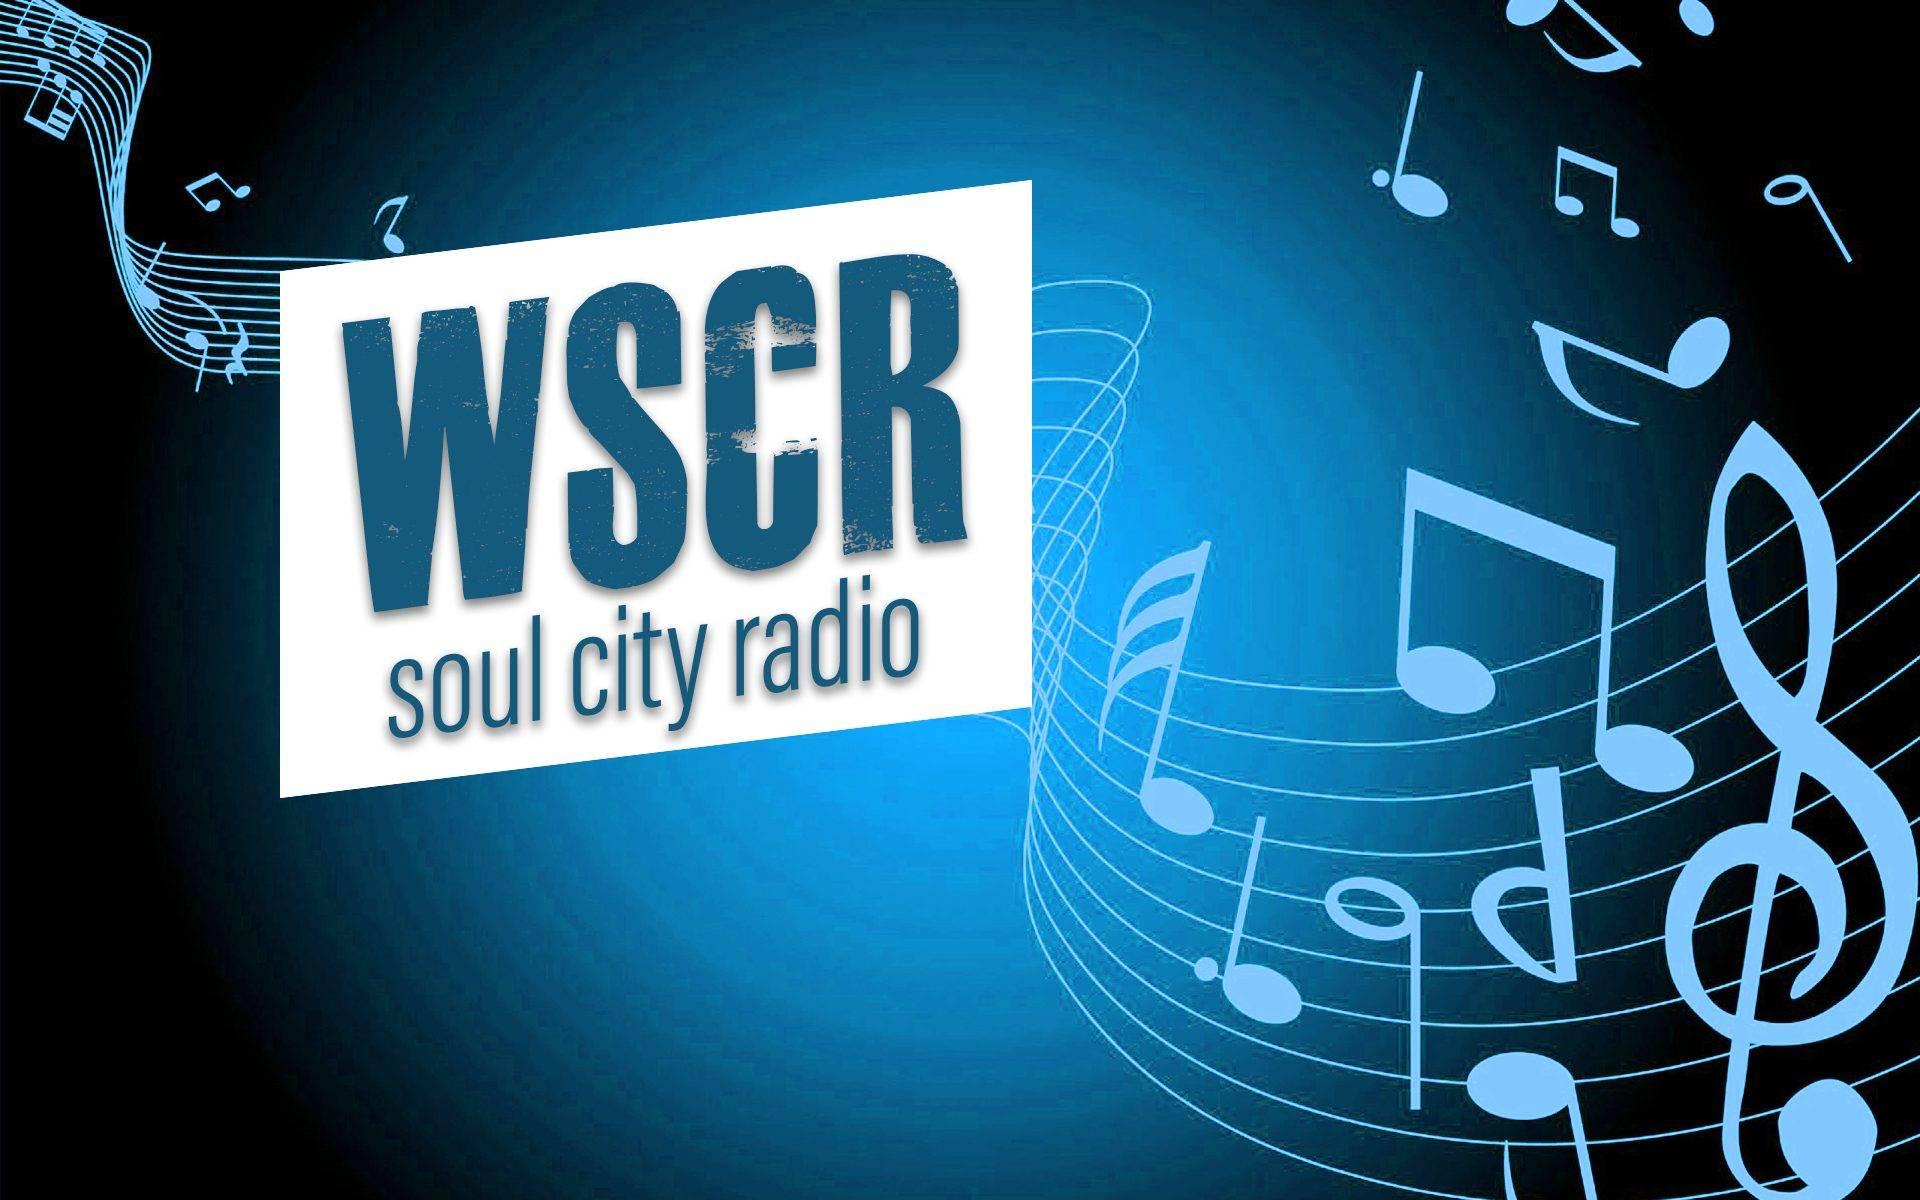 WSCR radio